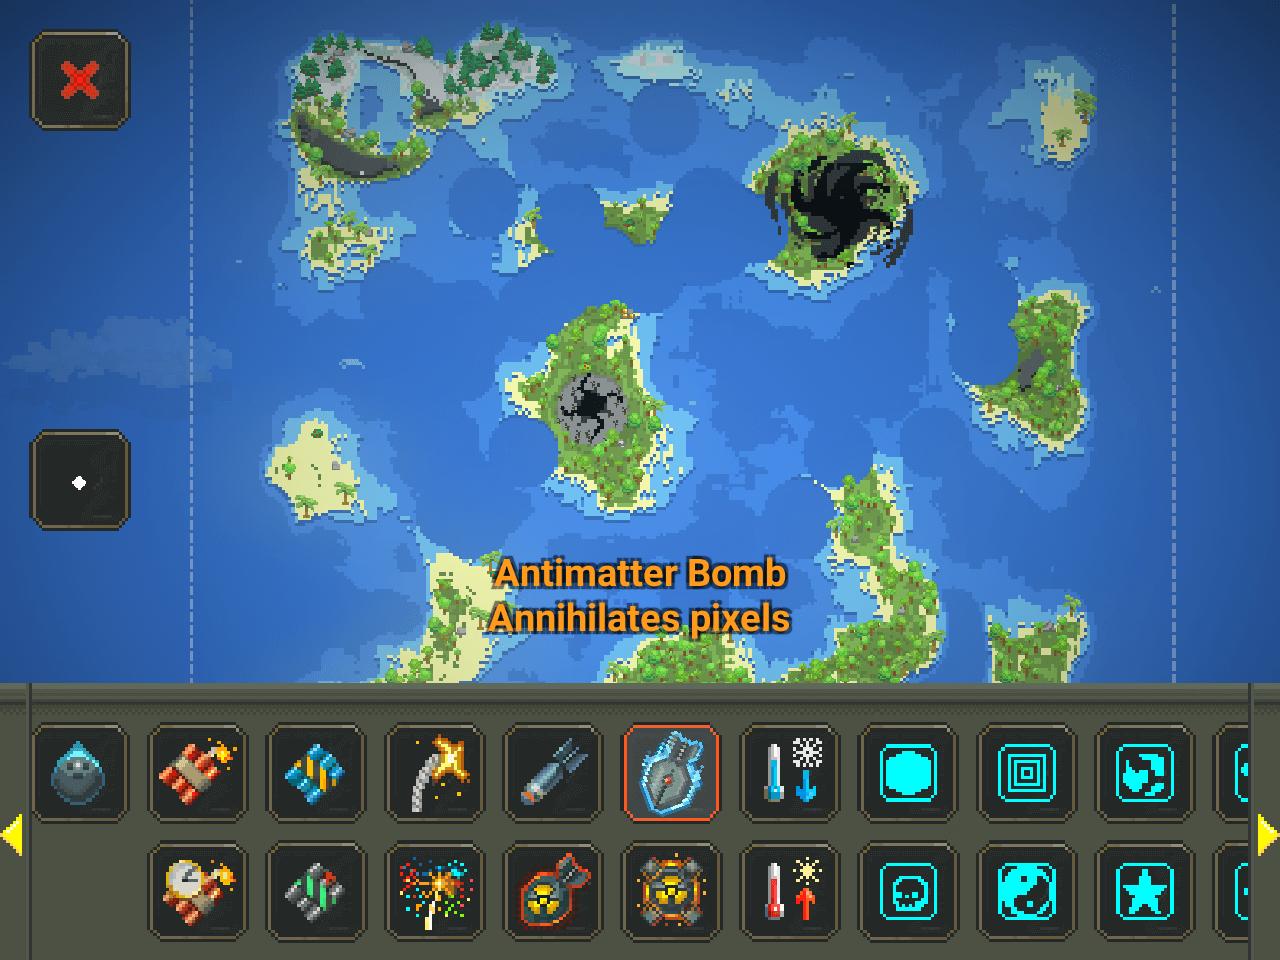 https://www.superworldbox.com/img/screenshots/010.png